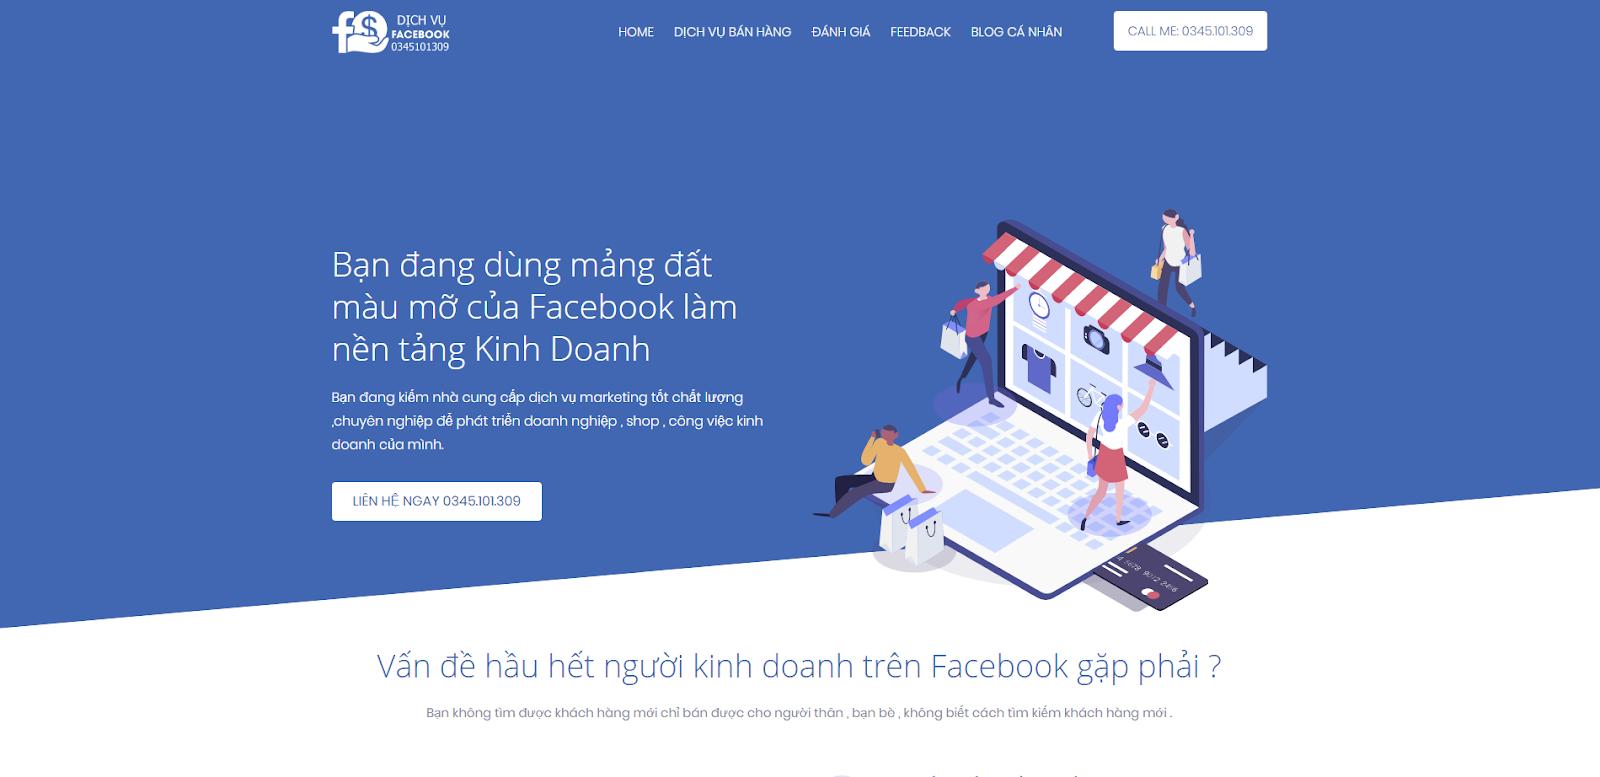 Share Template Dịch Vụ Facebook cực đẹp